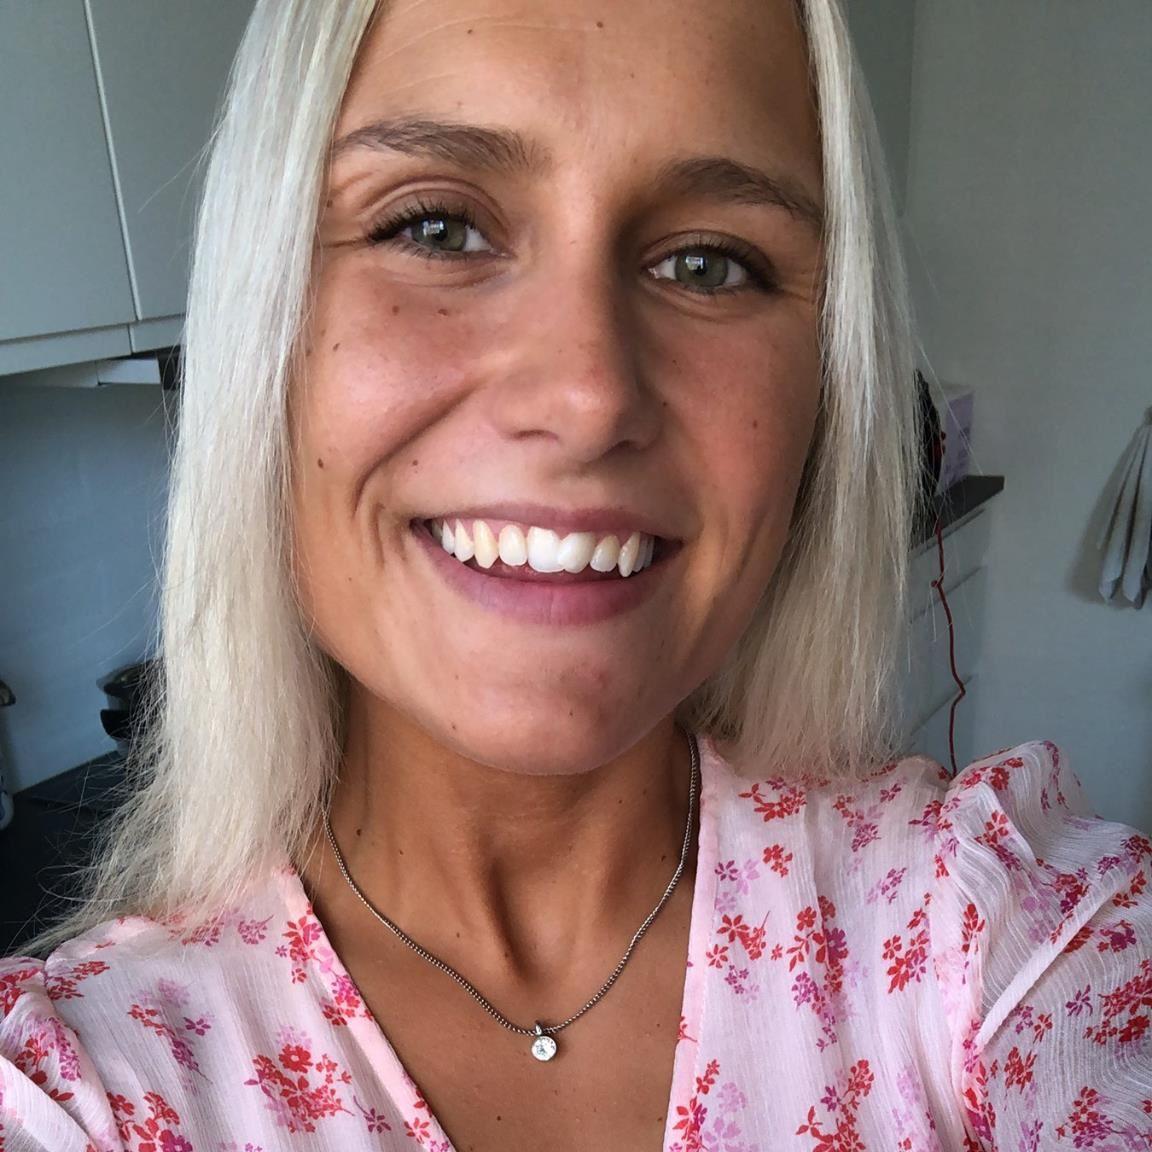 Mette Hindkjær